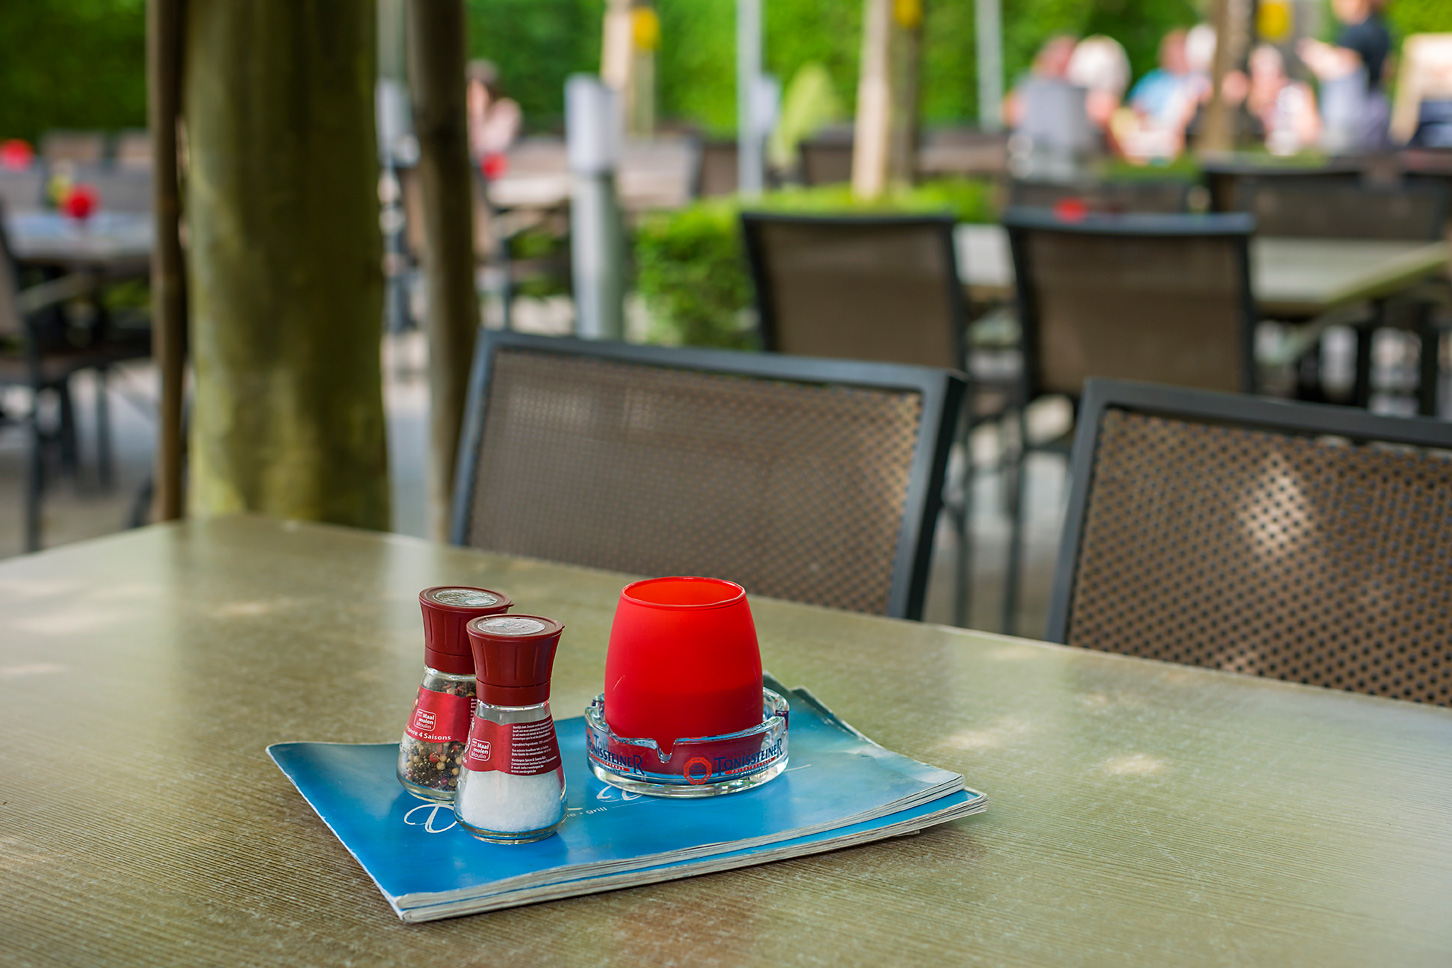 Brasserie-Bleu-Blanc-in-Oud-Heverlee_Bleu_Blanc_DSC0352_150613